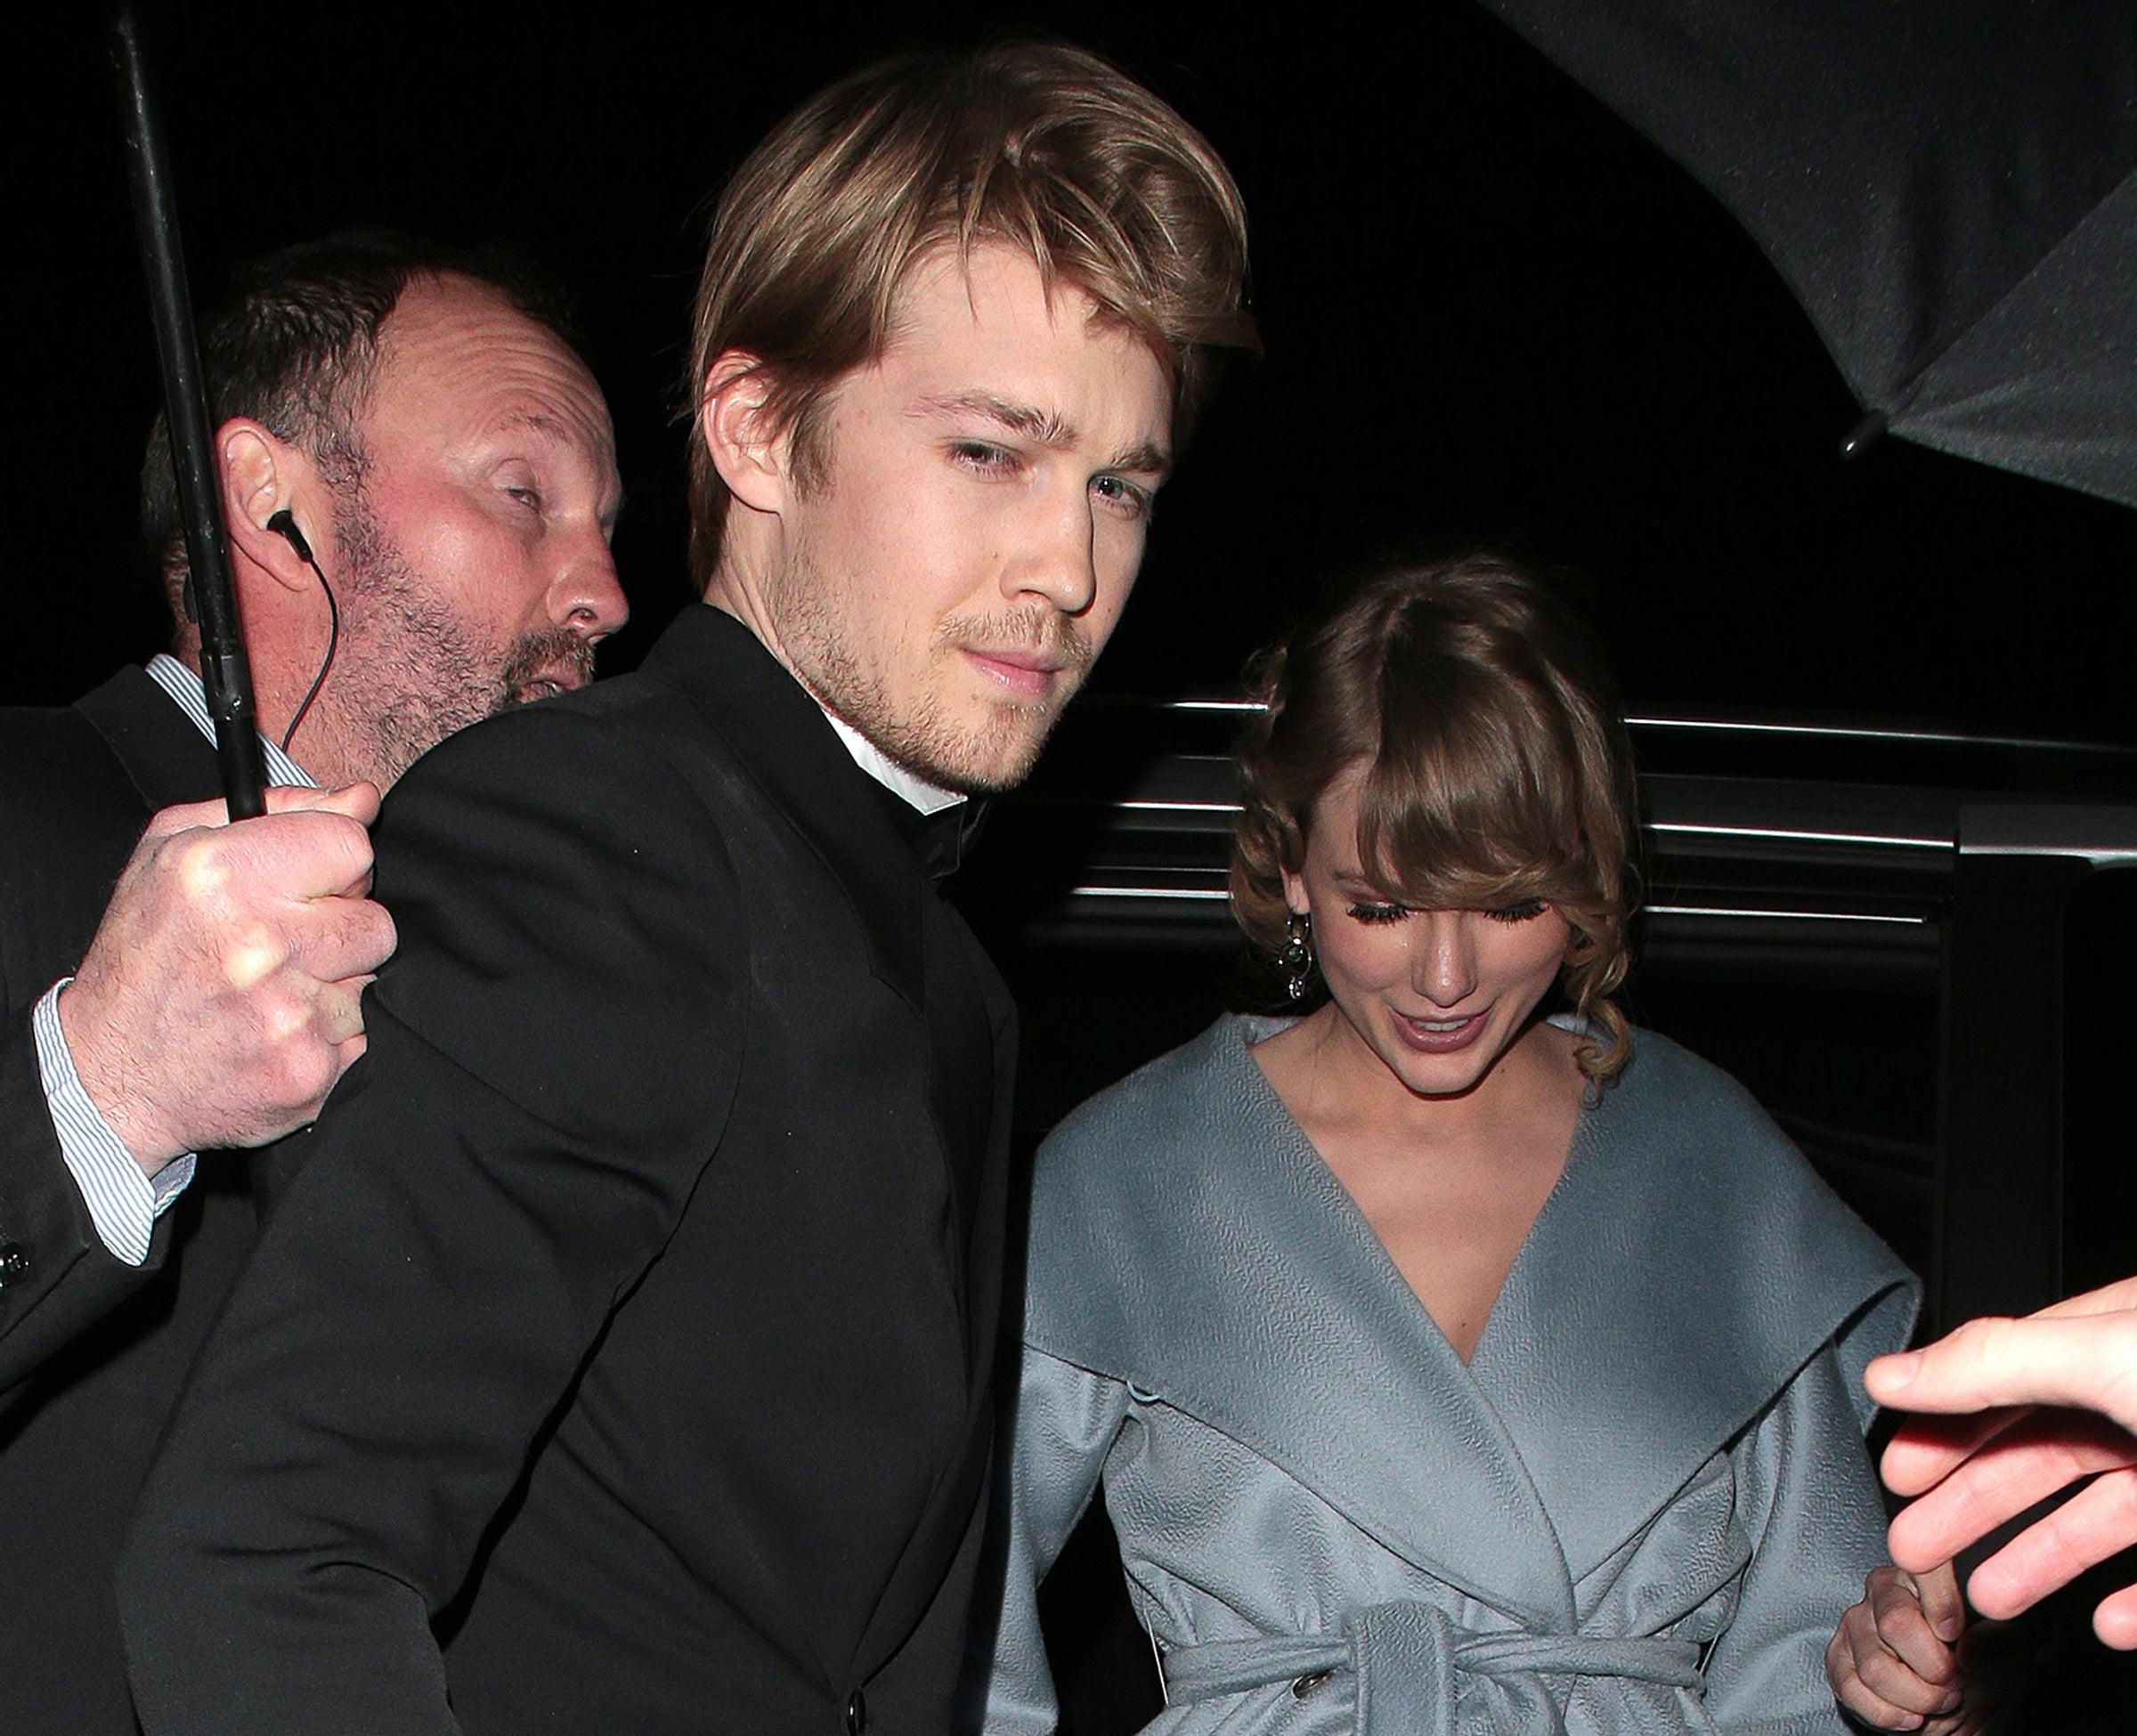 Joe helps Taylor exit a car